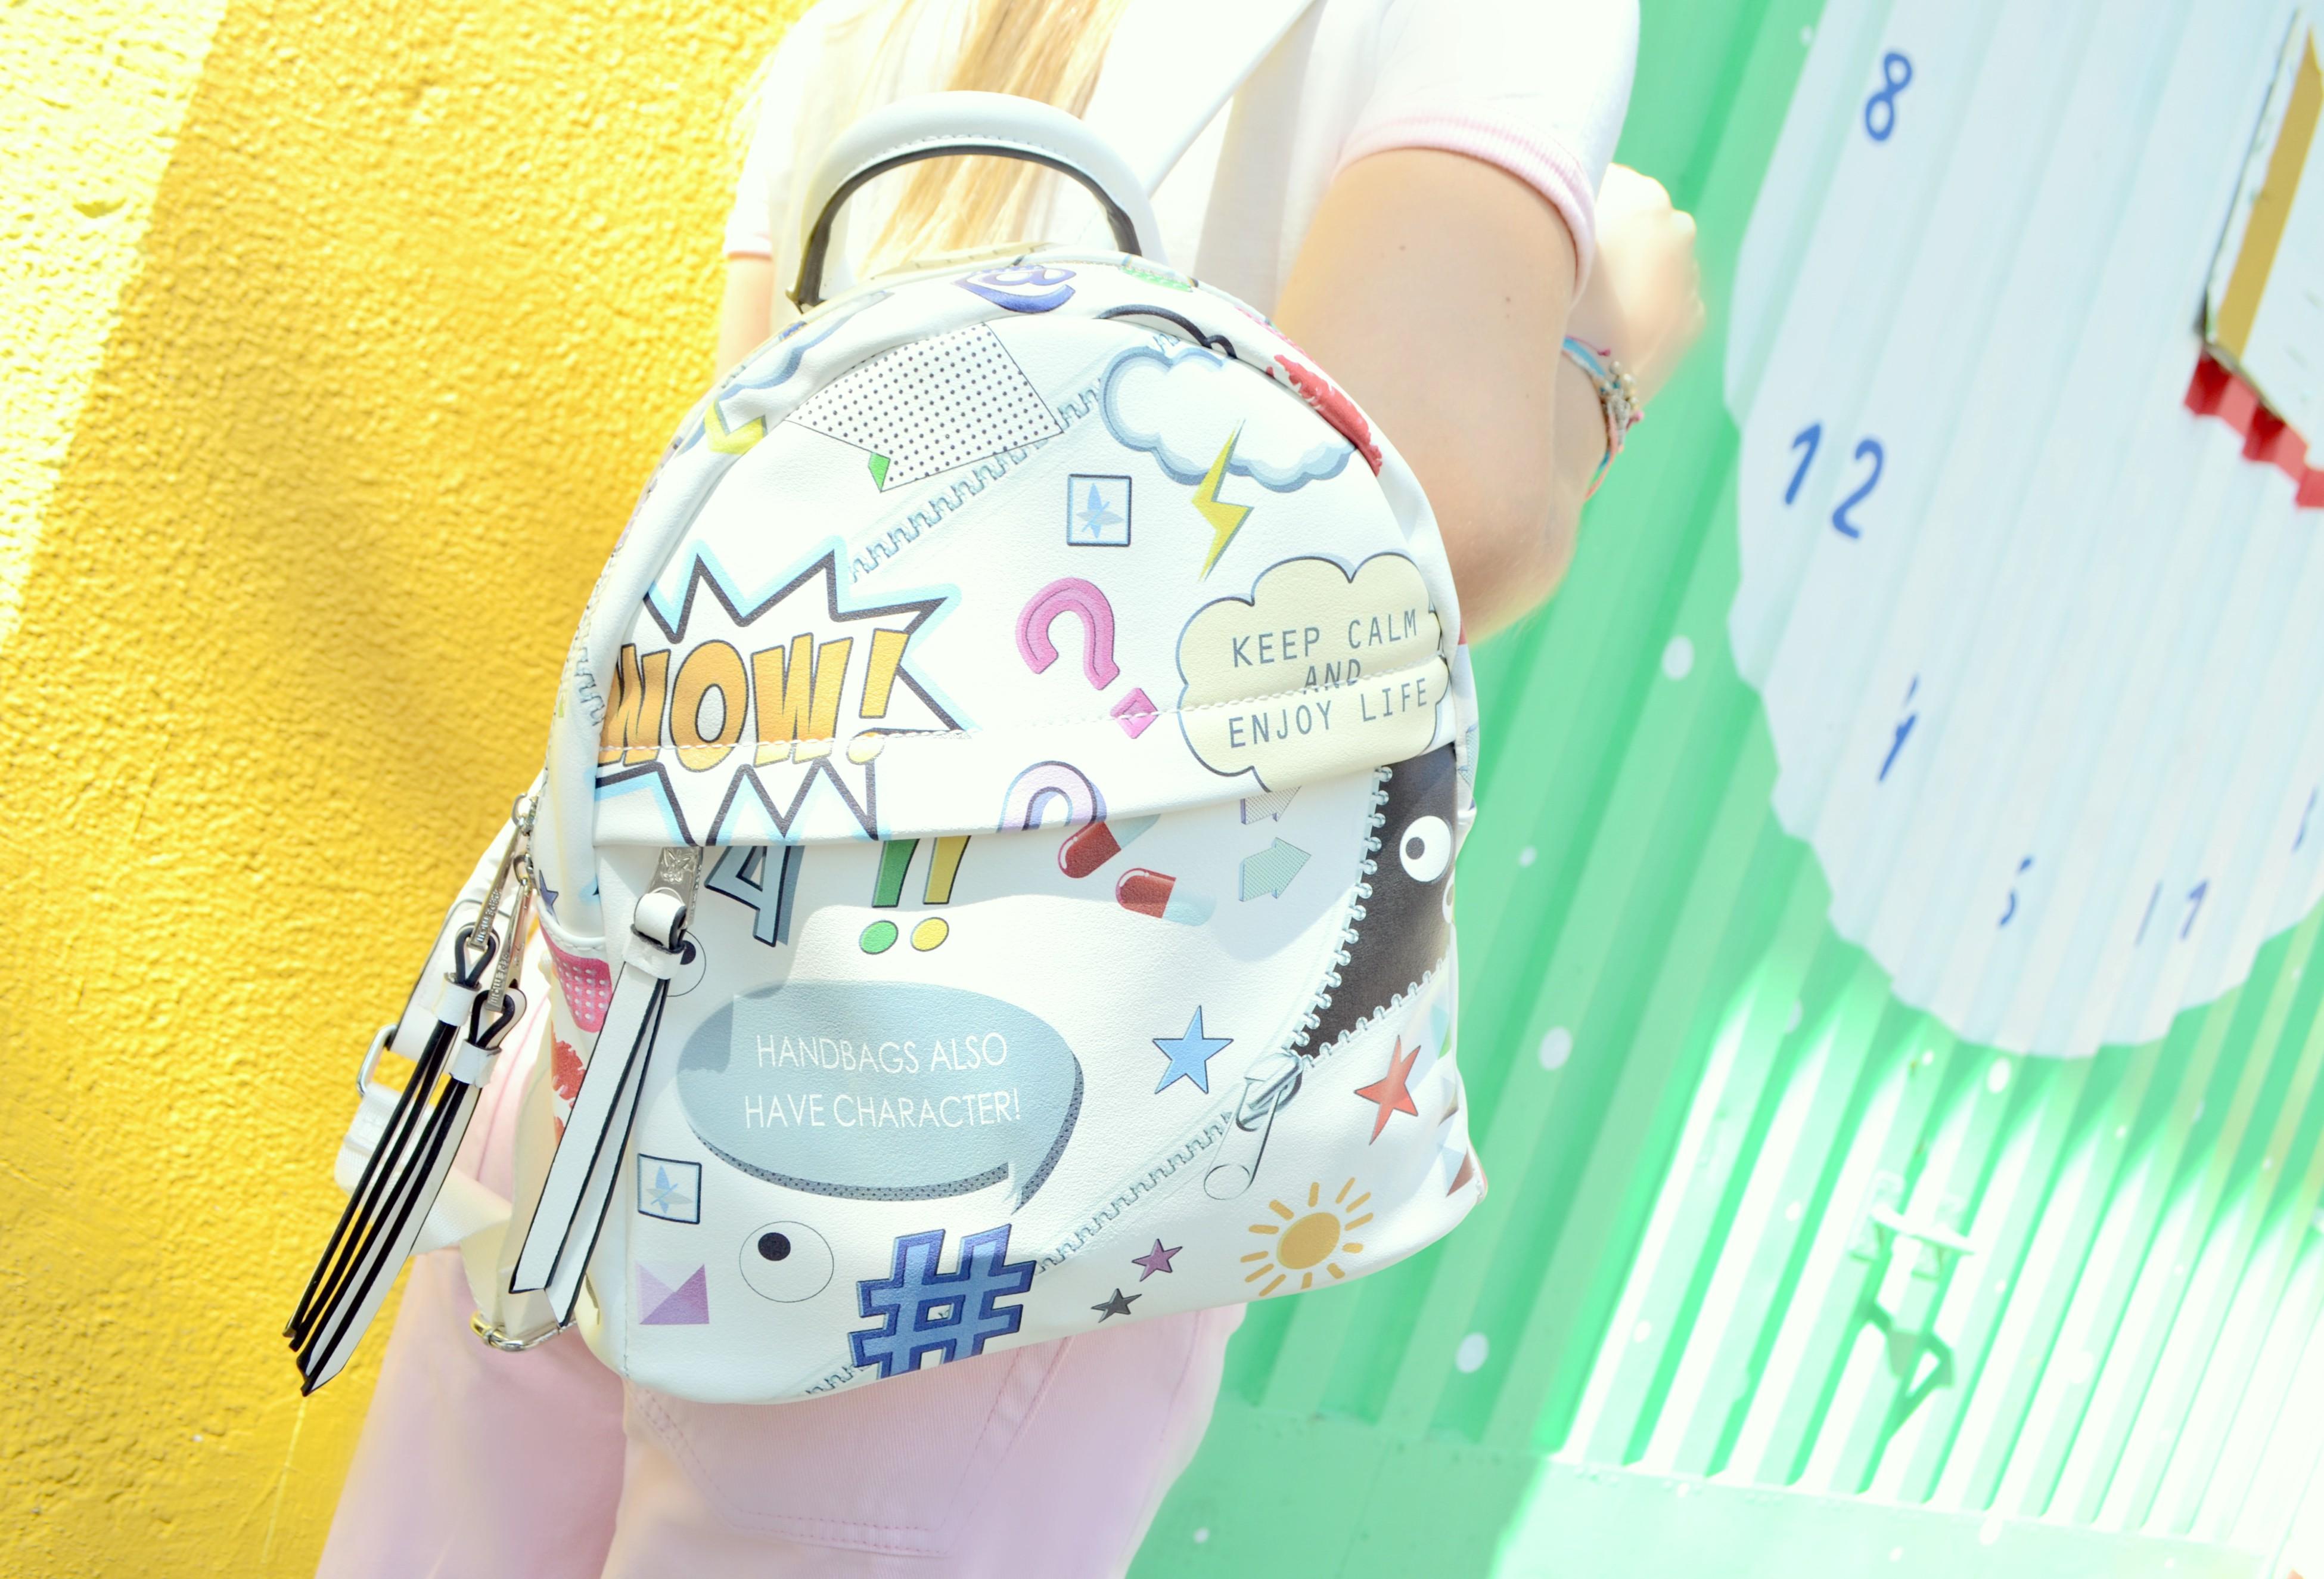 fashion-90s-bolsos-pepe-moll-ChicAdicta-blog-de-moda-Chic-Adicta-influencer-spain-funny-bags-primark-outfit-PiensaenChic-Piensa-en-Chic